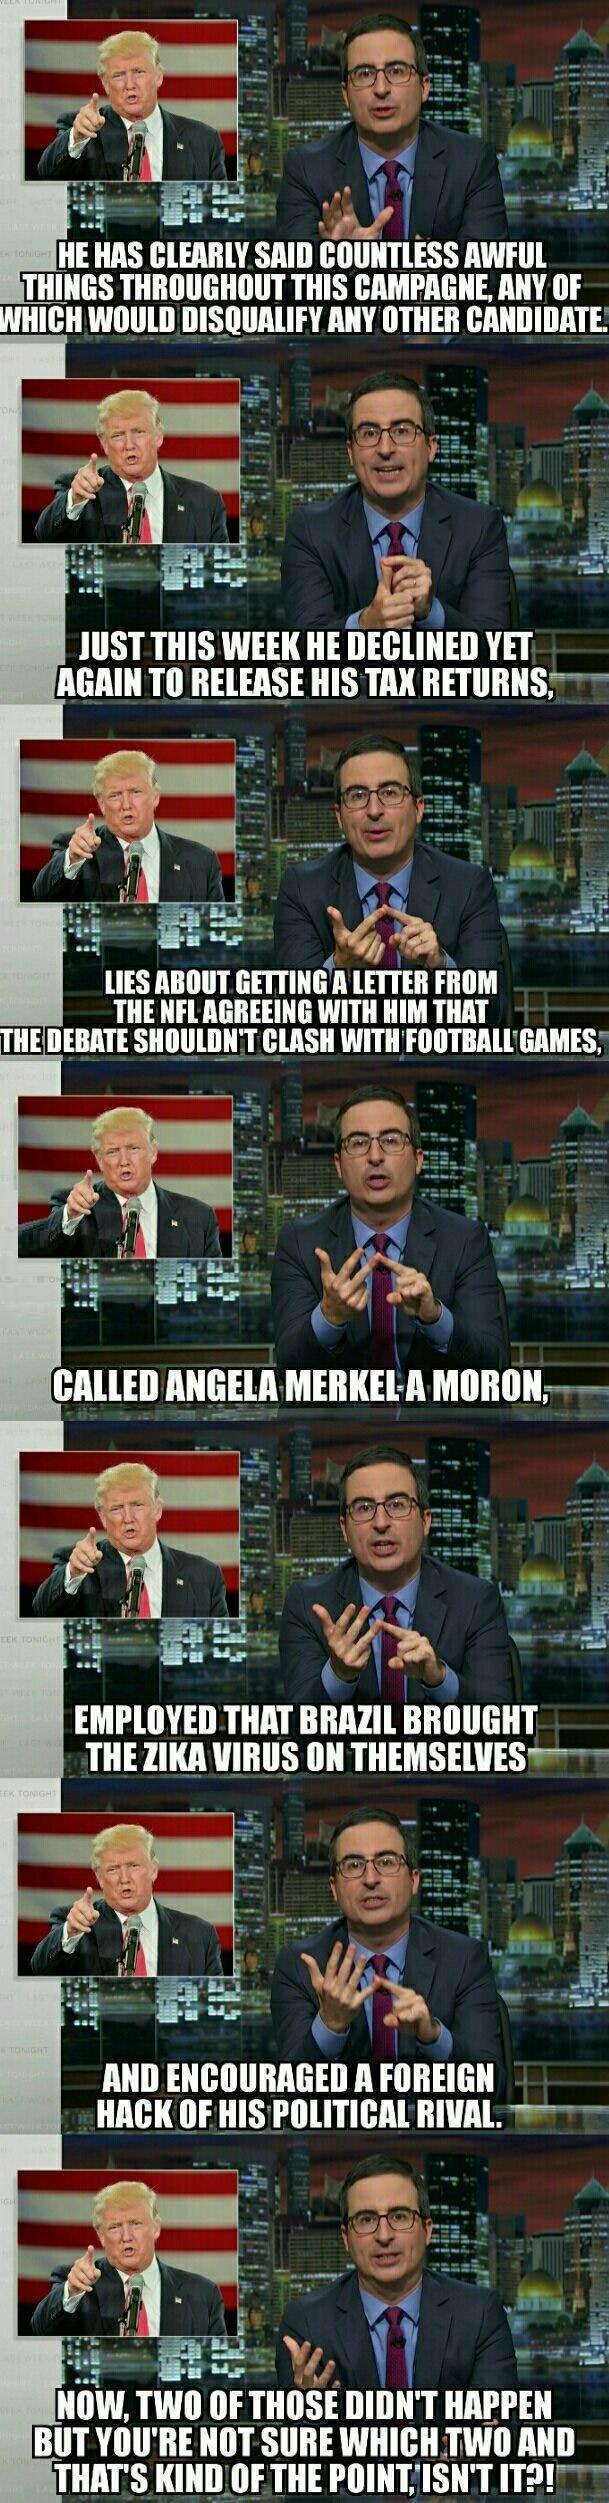 The awful things Trump has said